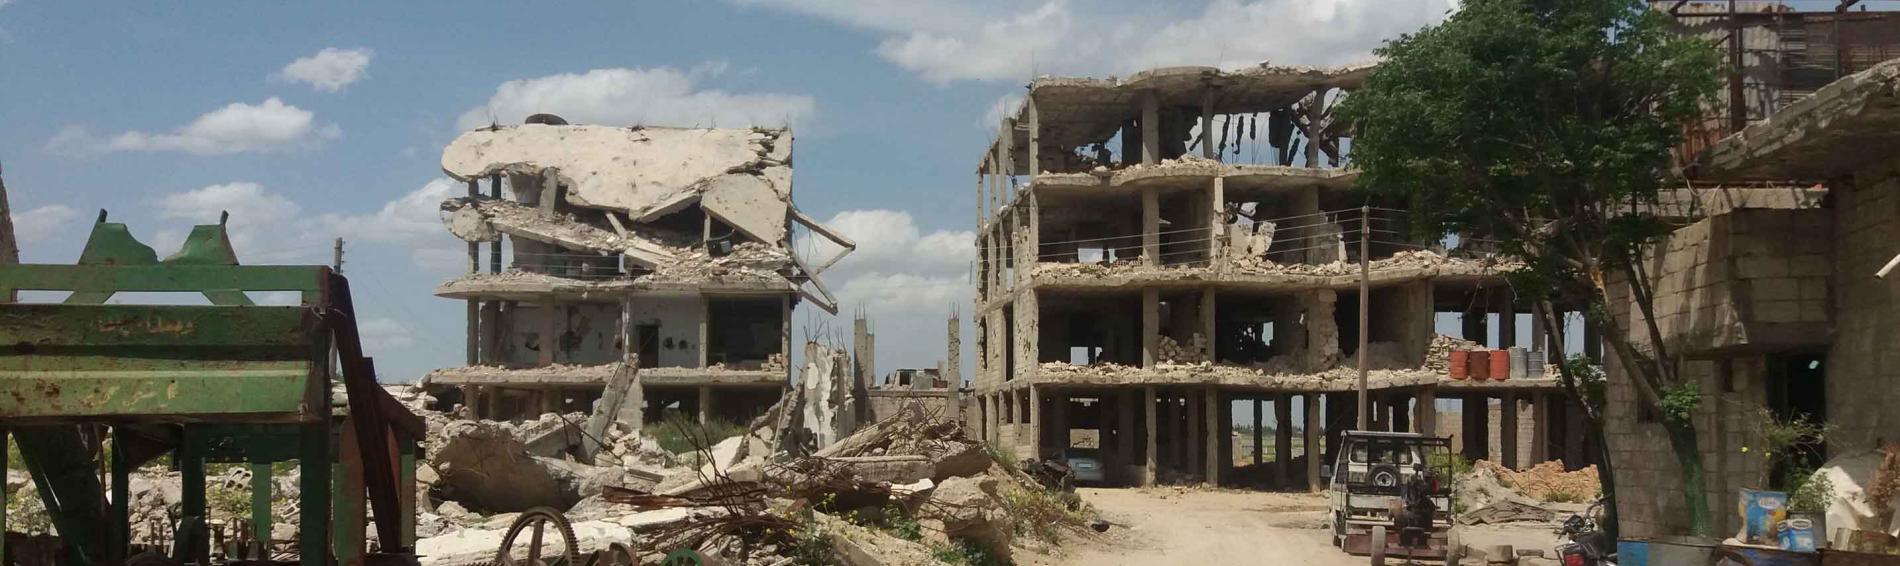 Angriff auf Zivilbevölkerung in Afrin. Foto: Medicos del Mundo.